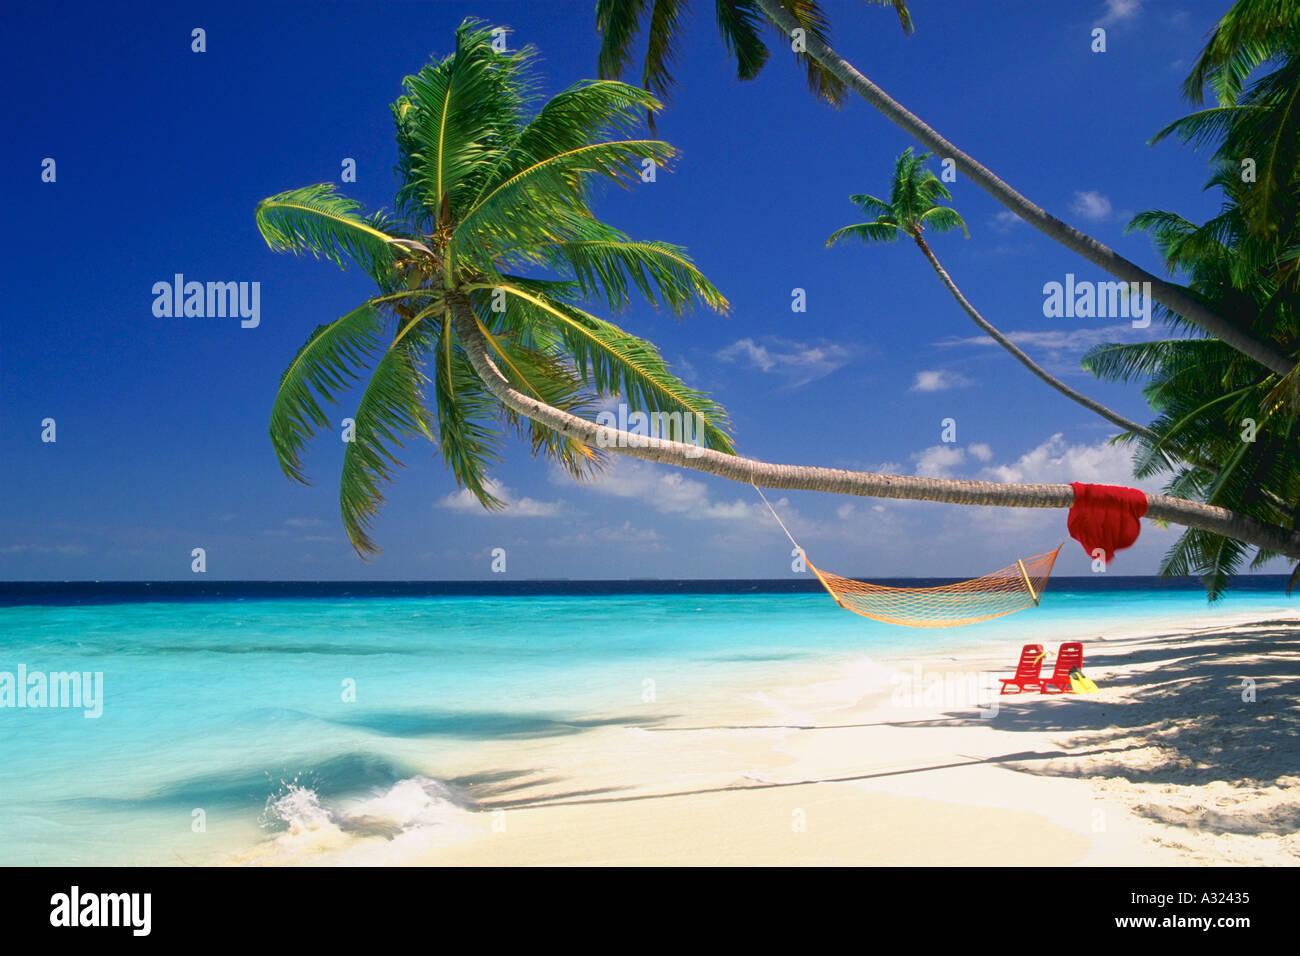 Super Beach Chairs Towel Ahmmock And Swim Fins On Beach Maldive Machost Co Dining Chair Design Ideas Machostcouk